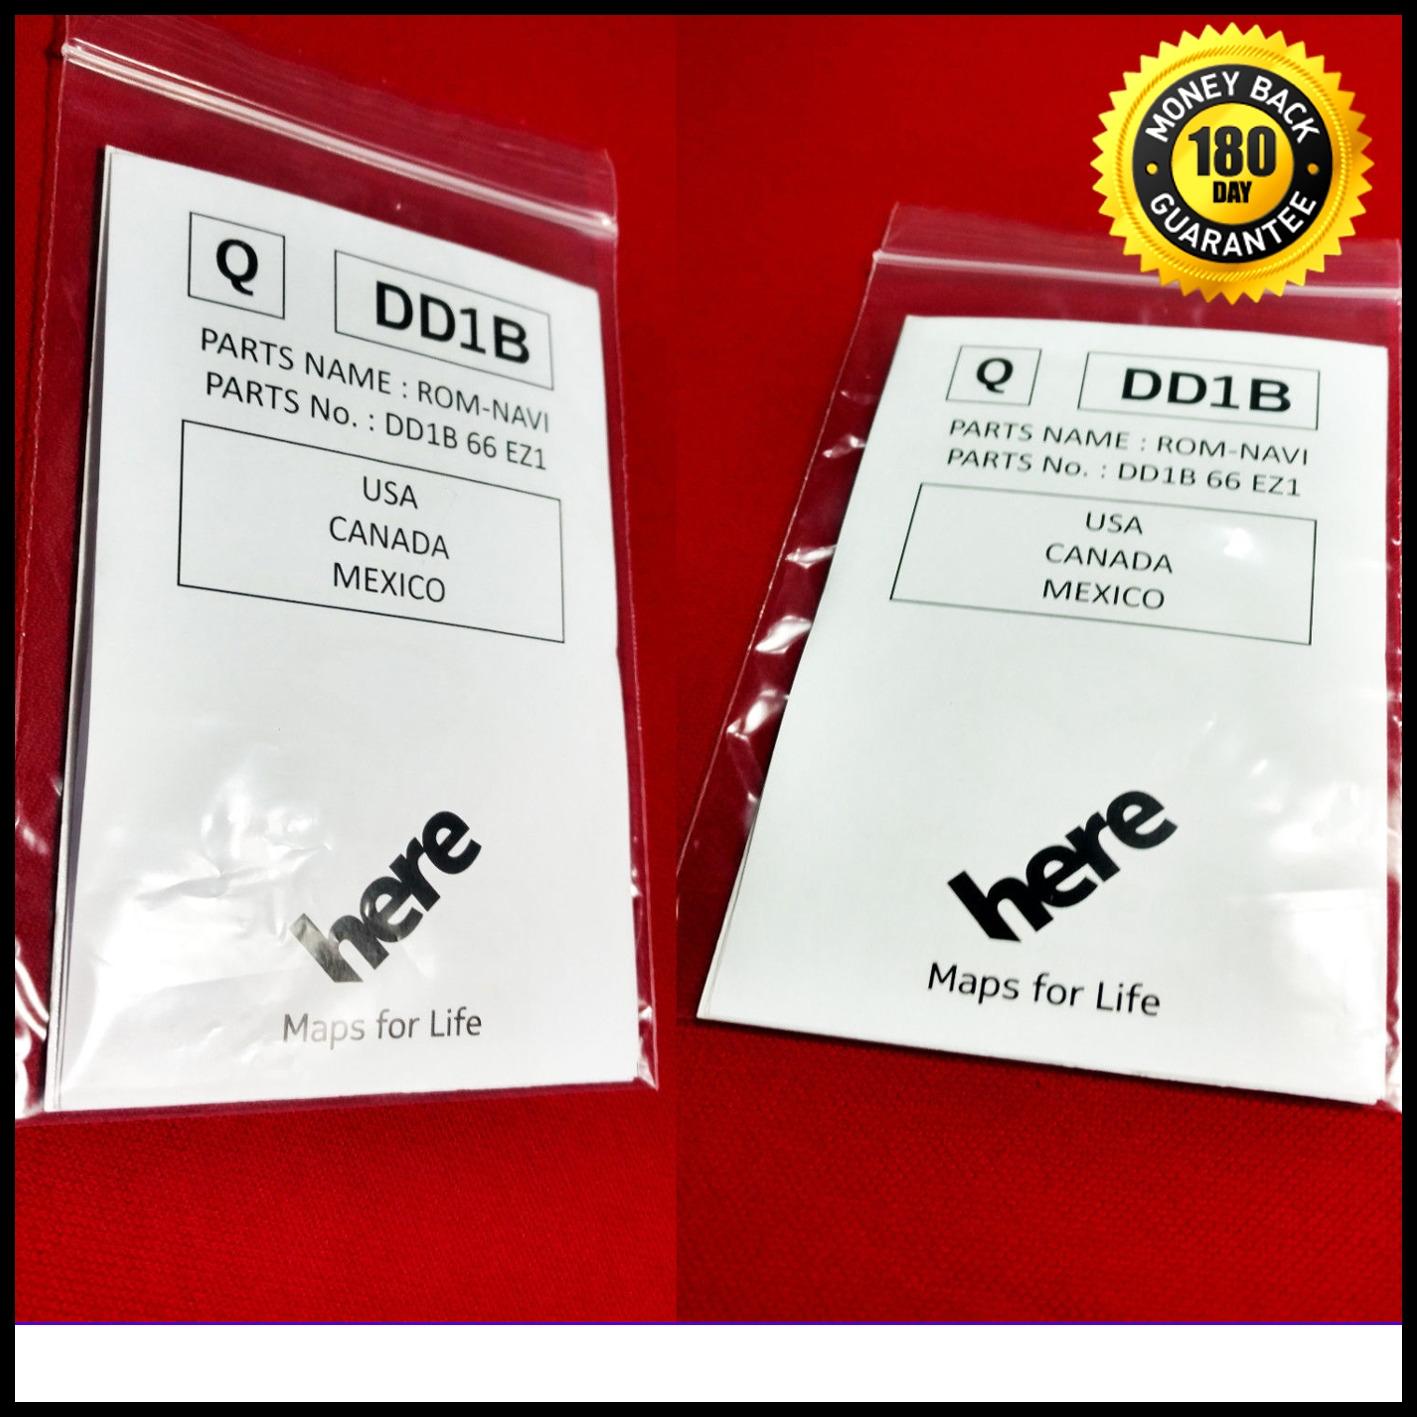 2018 2017 TOYOTA YARIS iA & 2016 SCION iA NAVIGATION SD CARD USA CAN PTMZD 1 of 2FREE Shipping